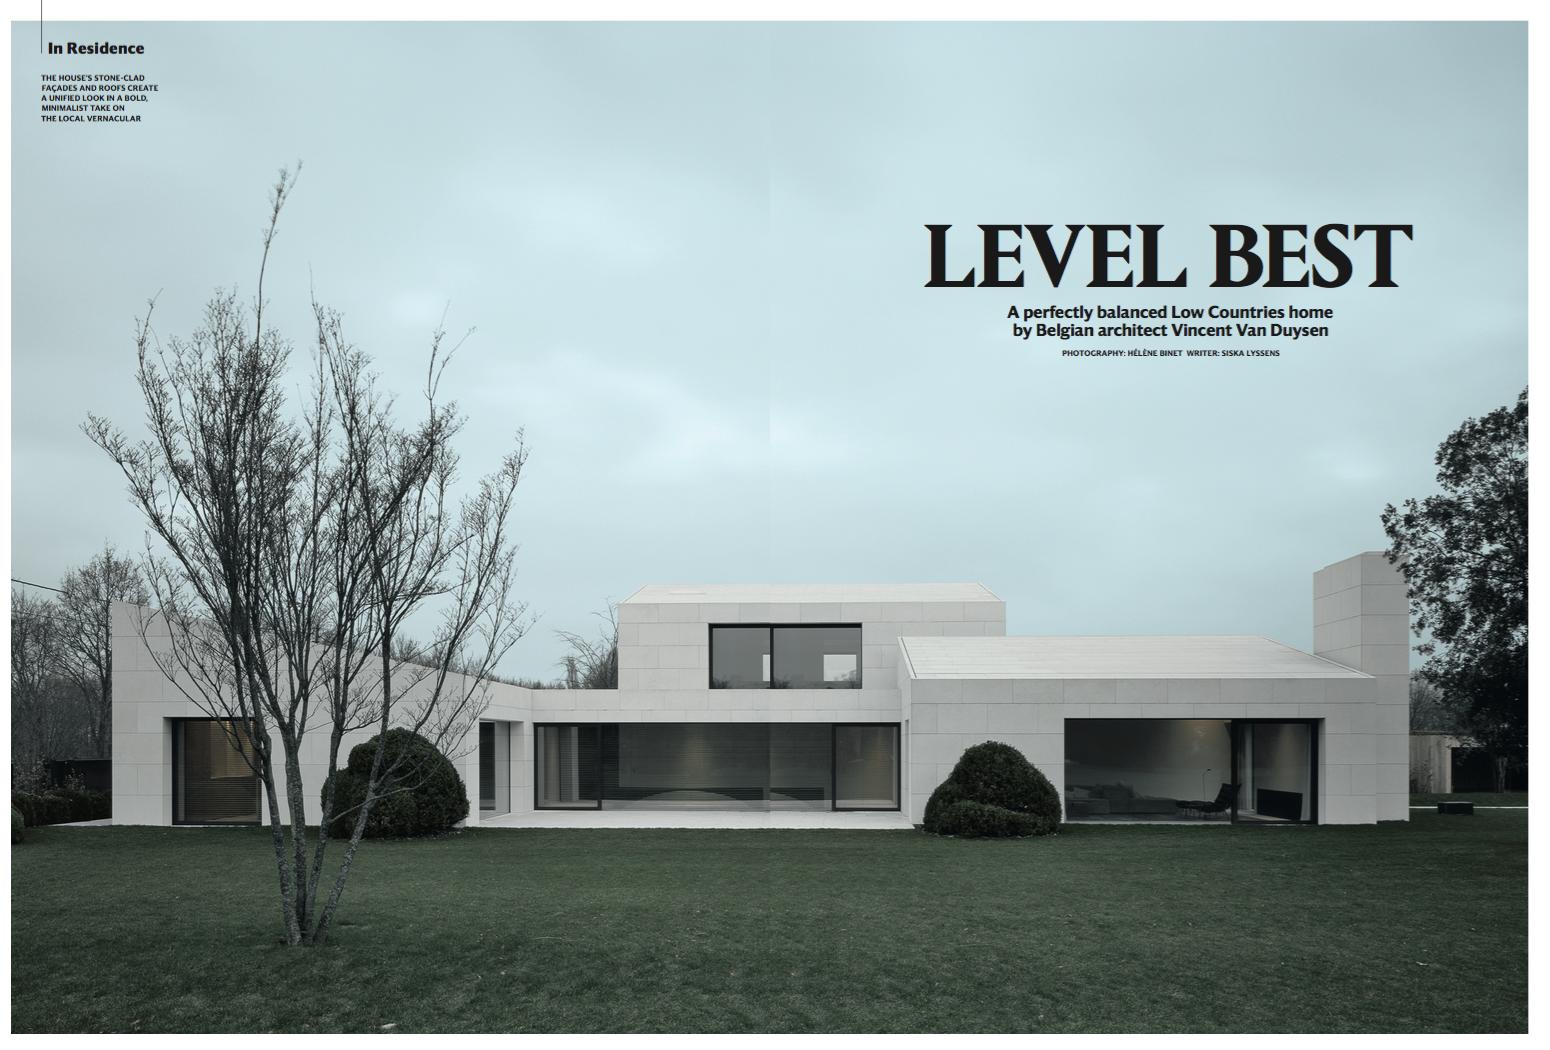 Level Best